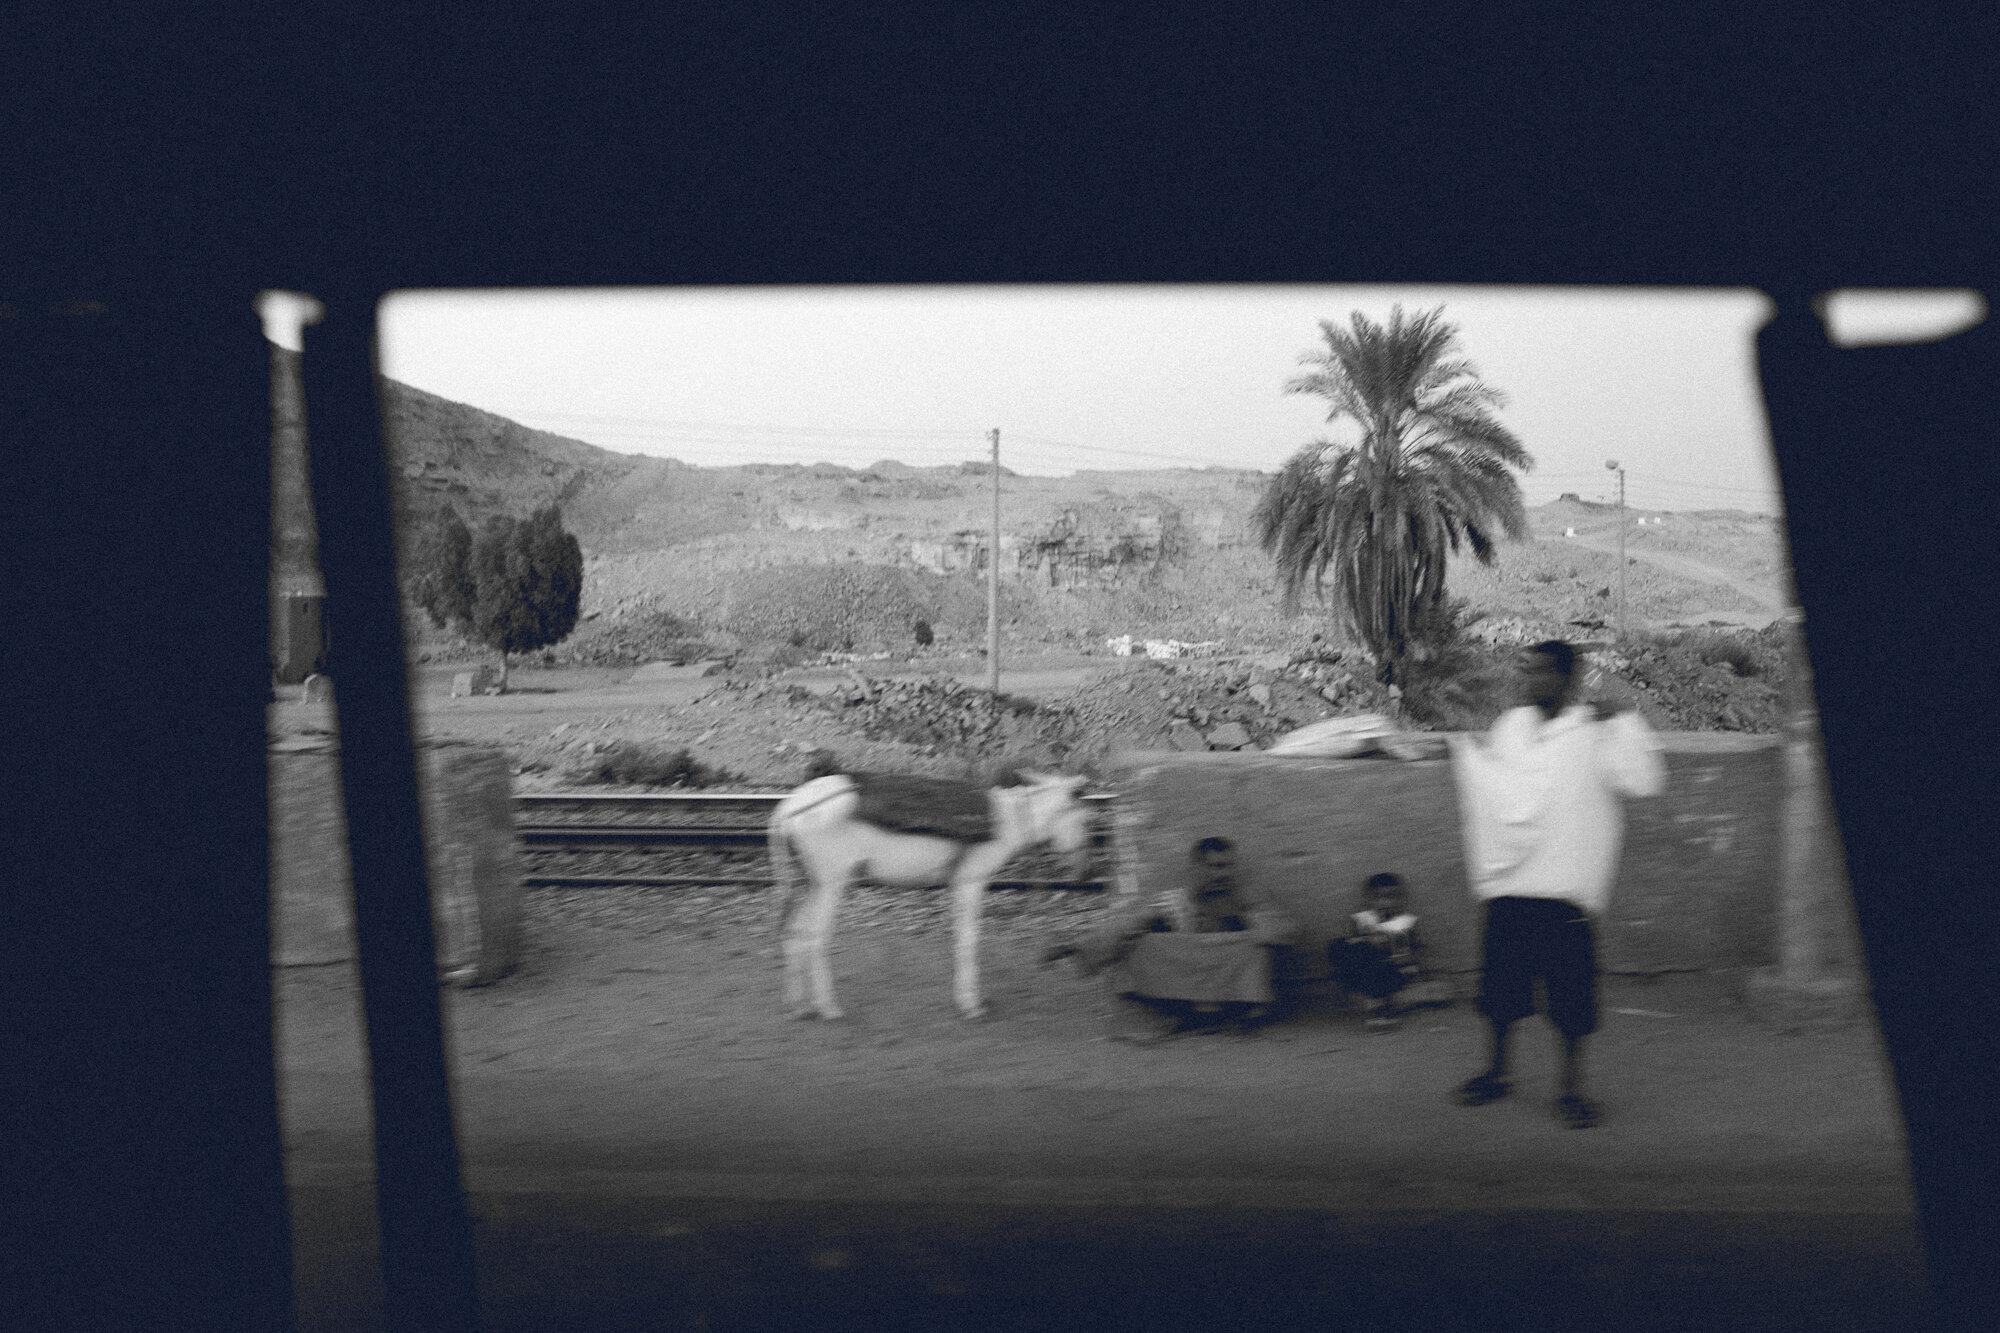 20190811_Aswan_0247-3.JPG